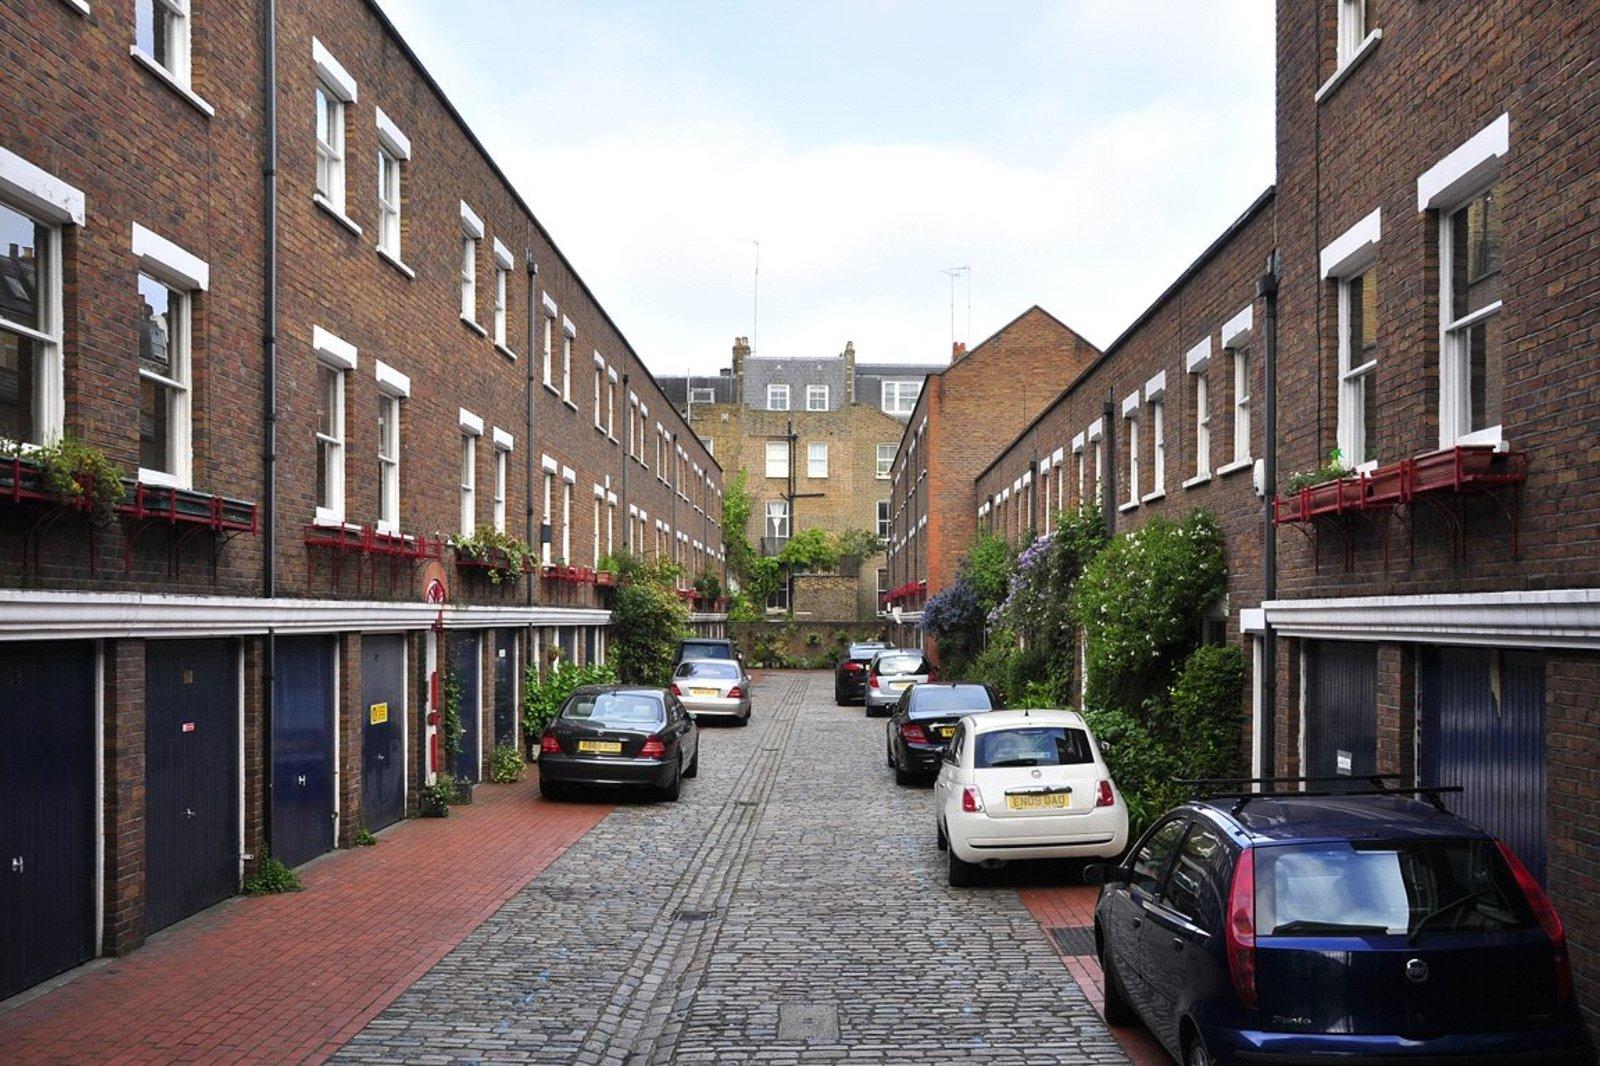 shrewsbury mews notting hill london w2 lurot brand. Black Bedroom Furniture Sets. Home Design Ideas